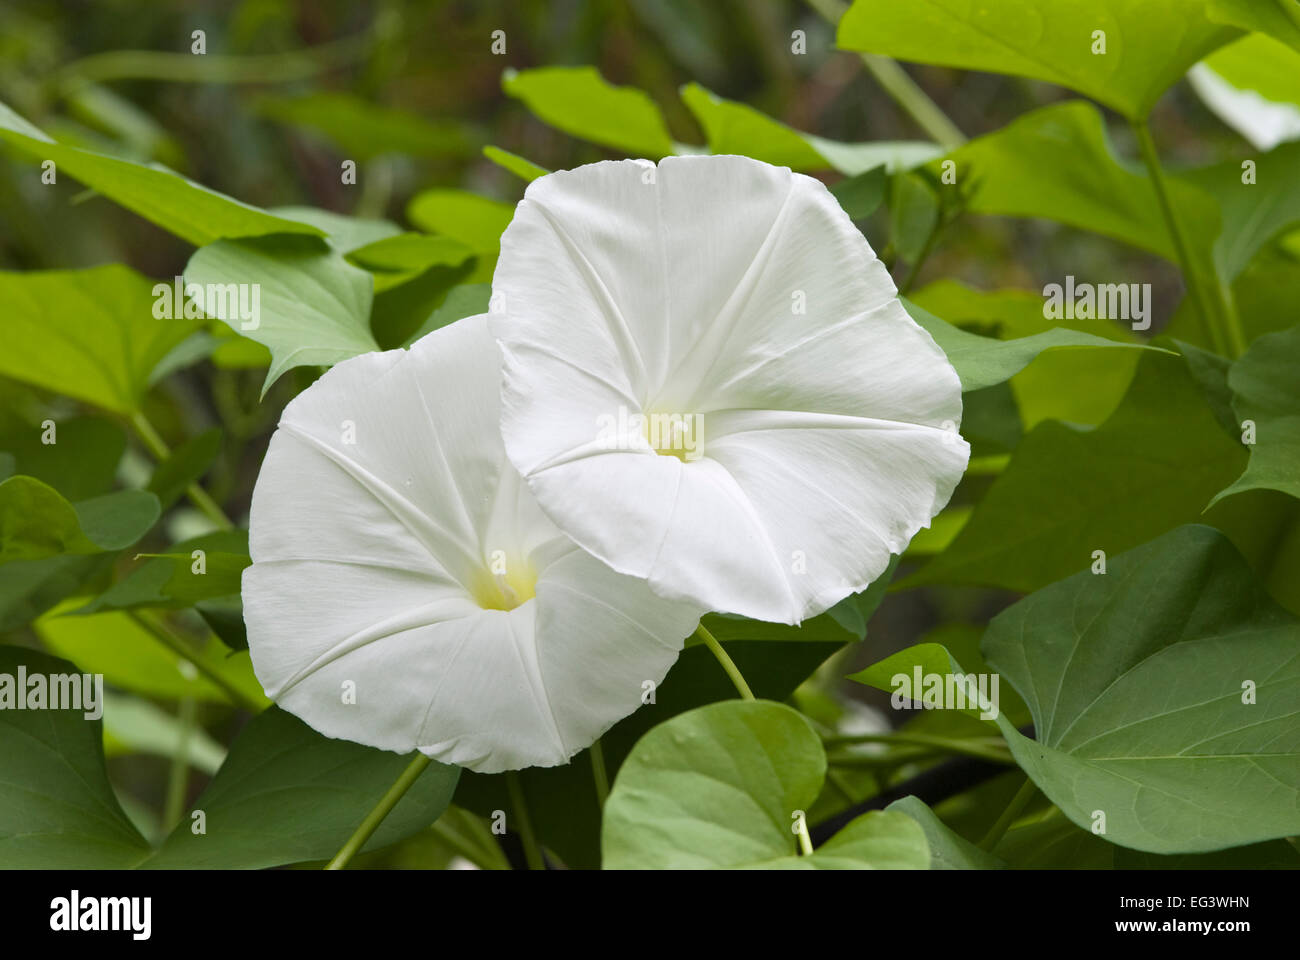 Morning Glory Flowers - Ipomoea alba - Stock Image